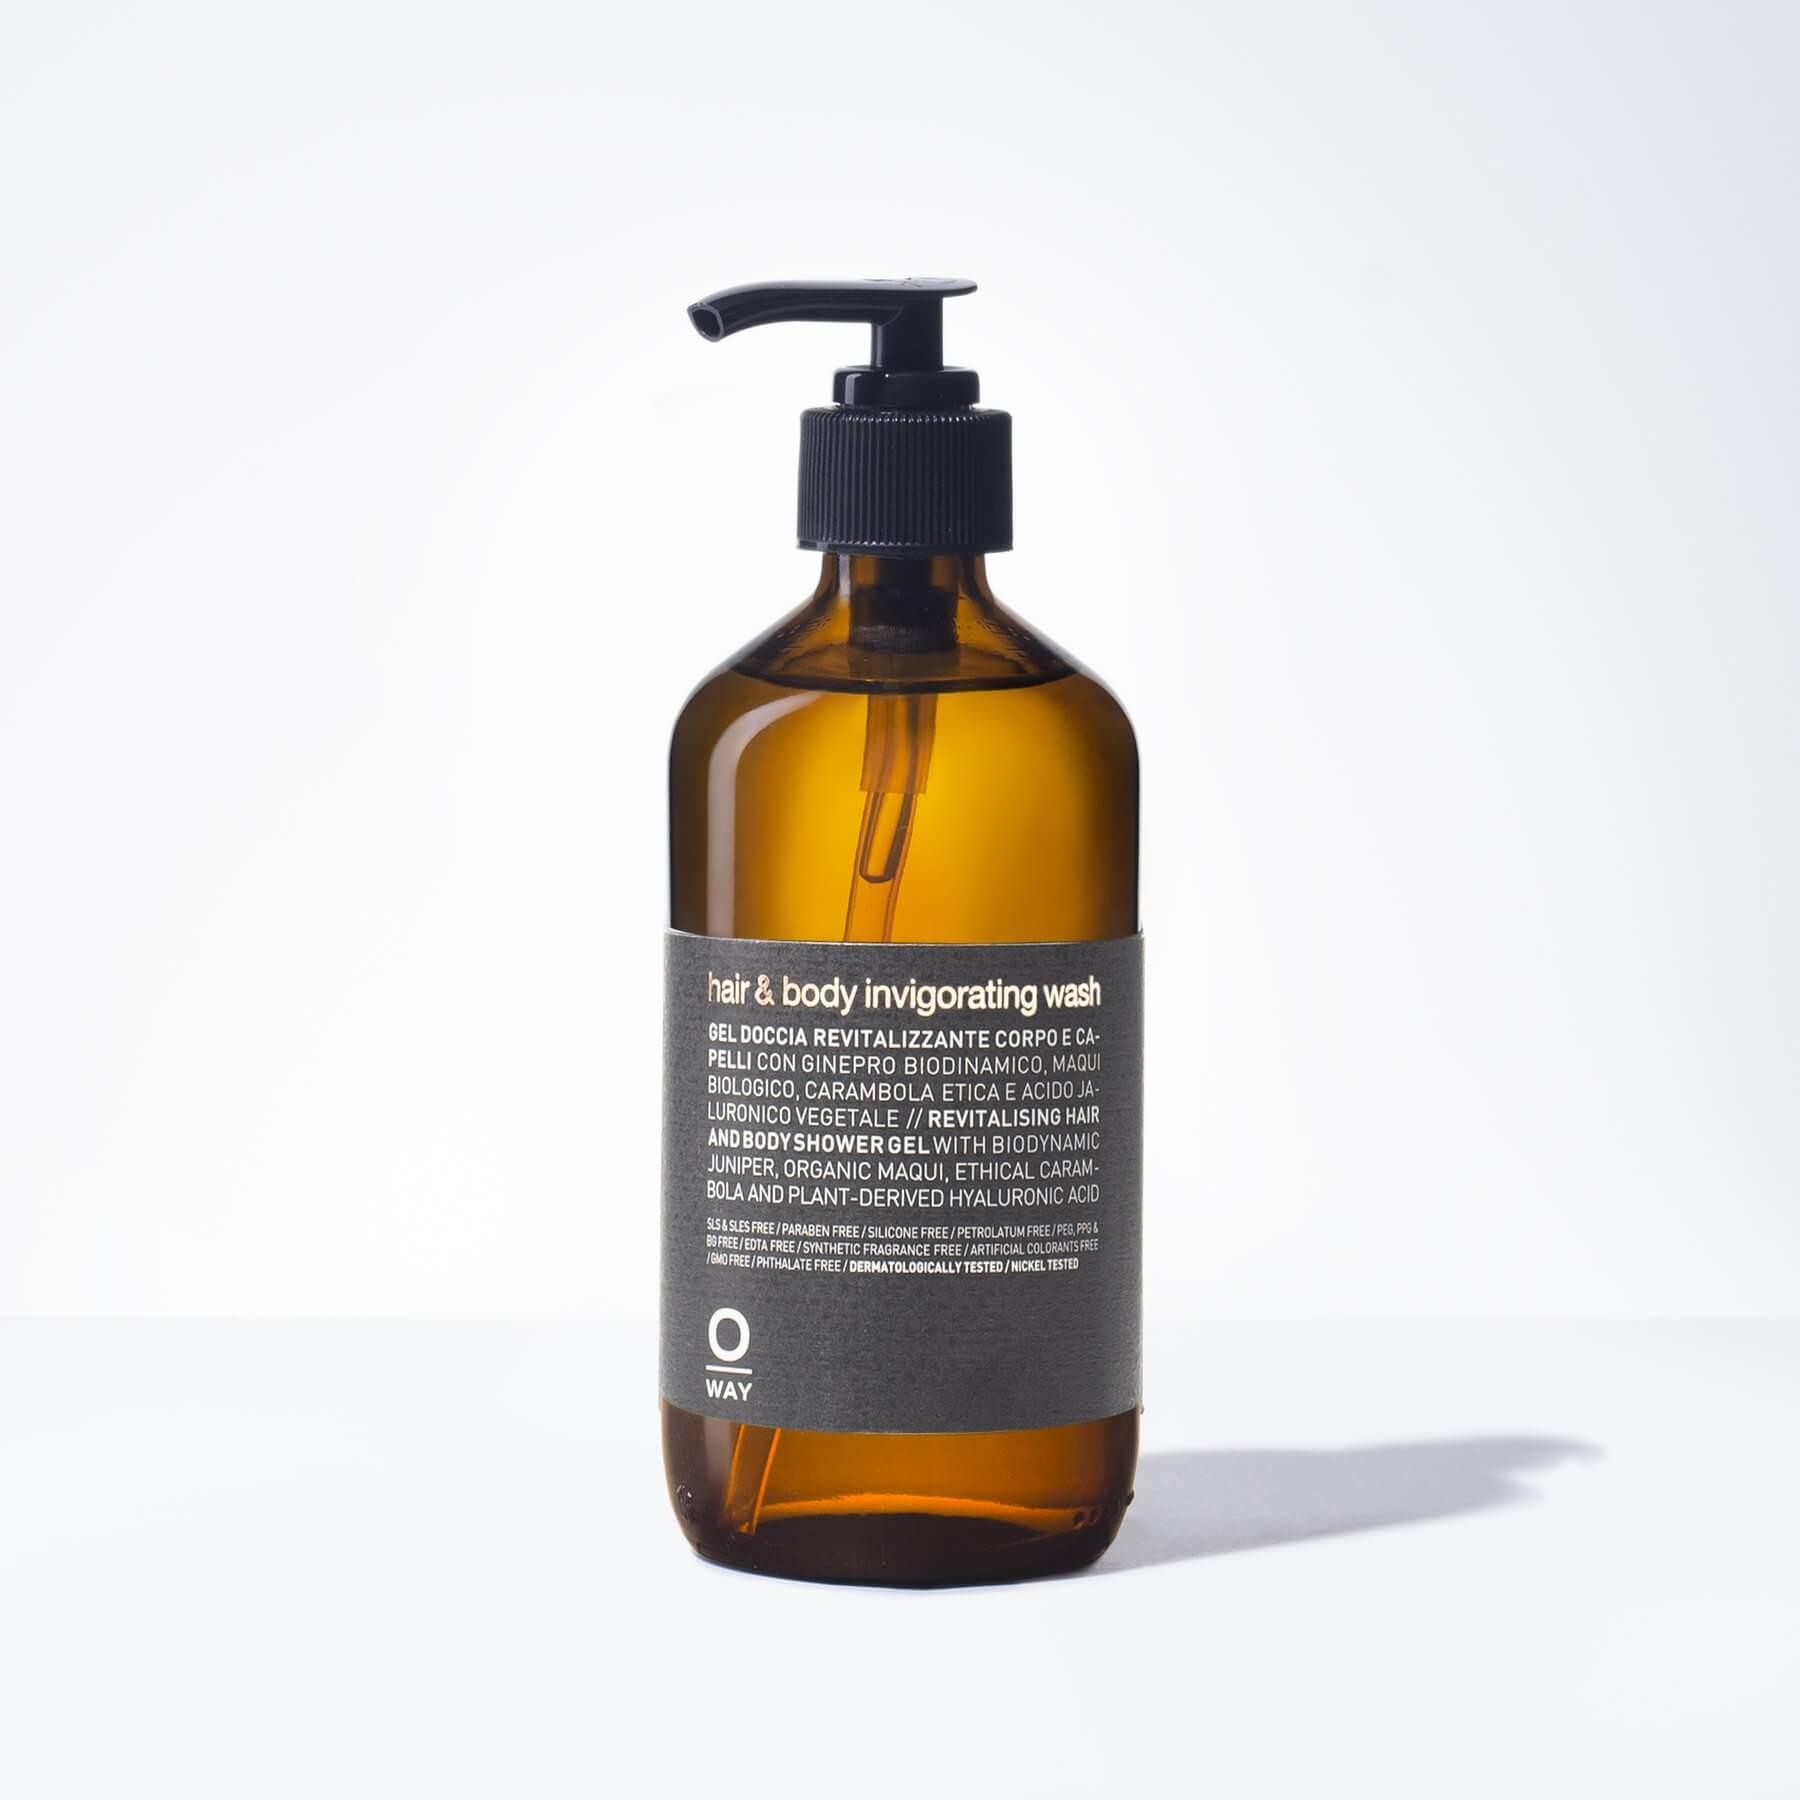 Oway_Hair_Body_Invigorating_Wash_1800x1800